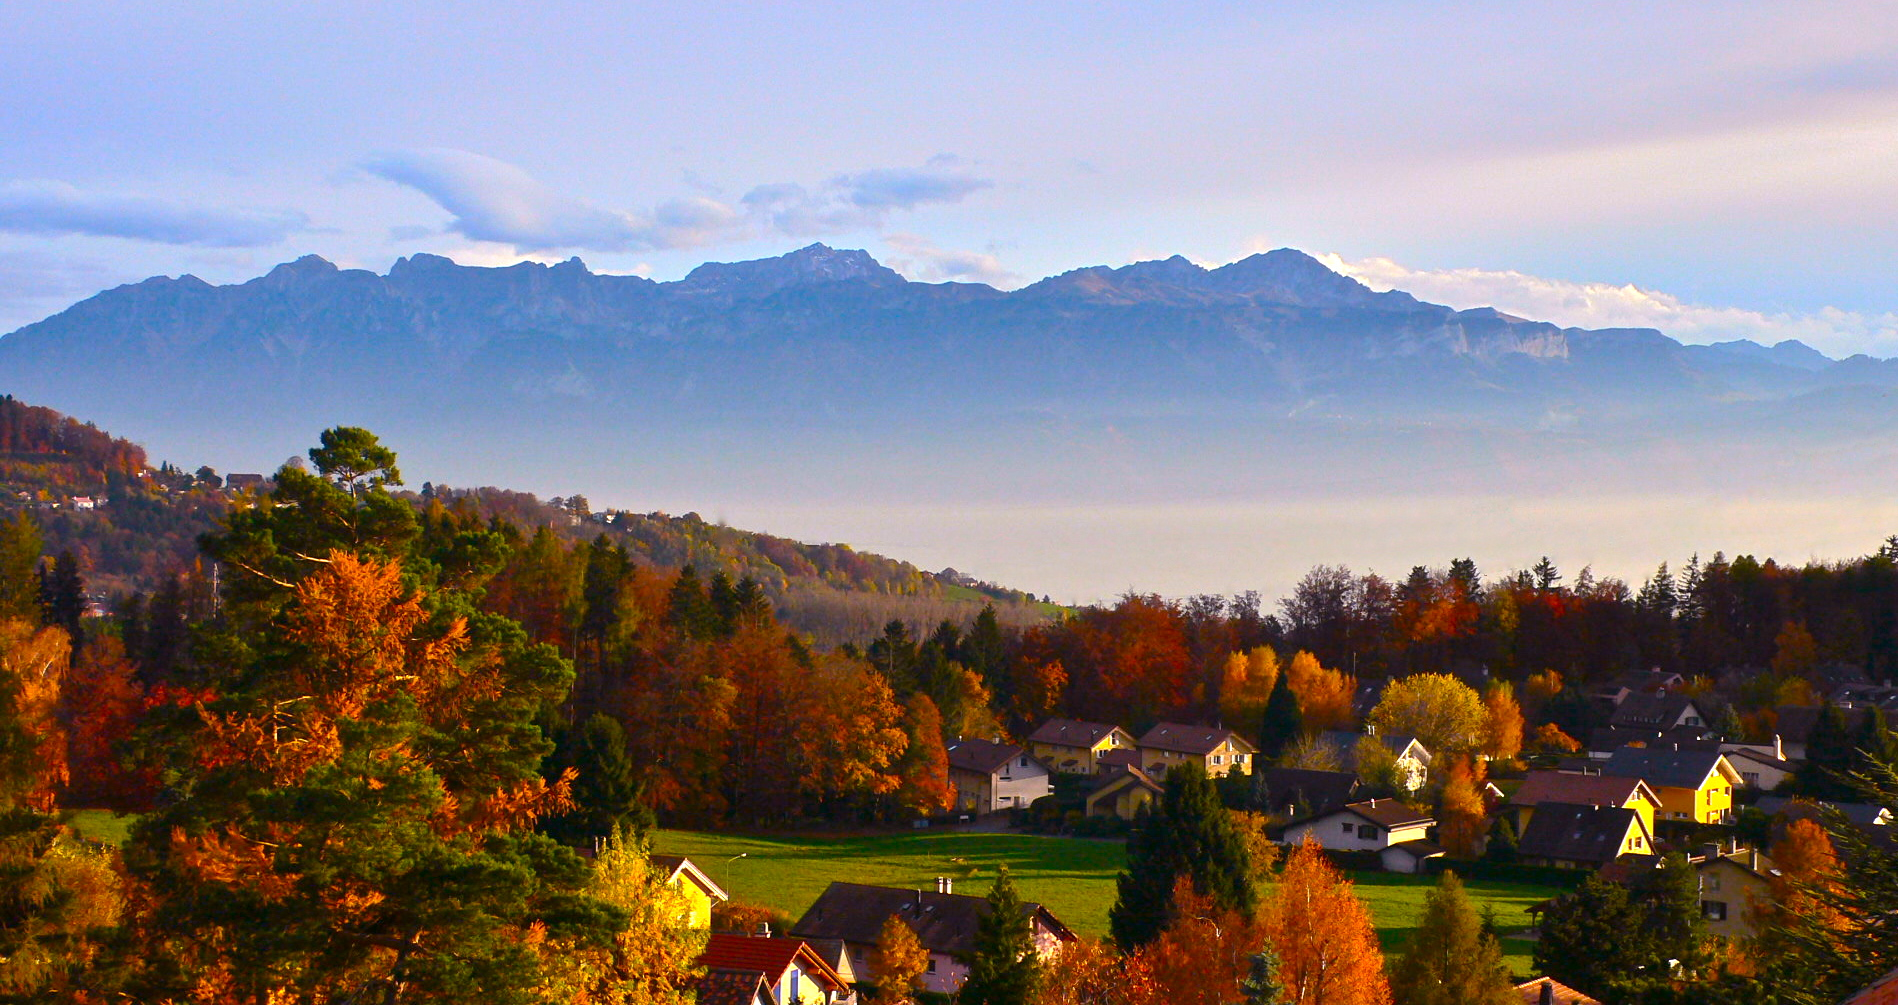 automne suisse photo et image paysages paysages de campagne nature images fotocommunity. Black Bedroom Furniture Sets. Home Design Ideas